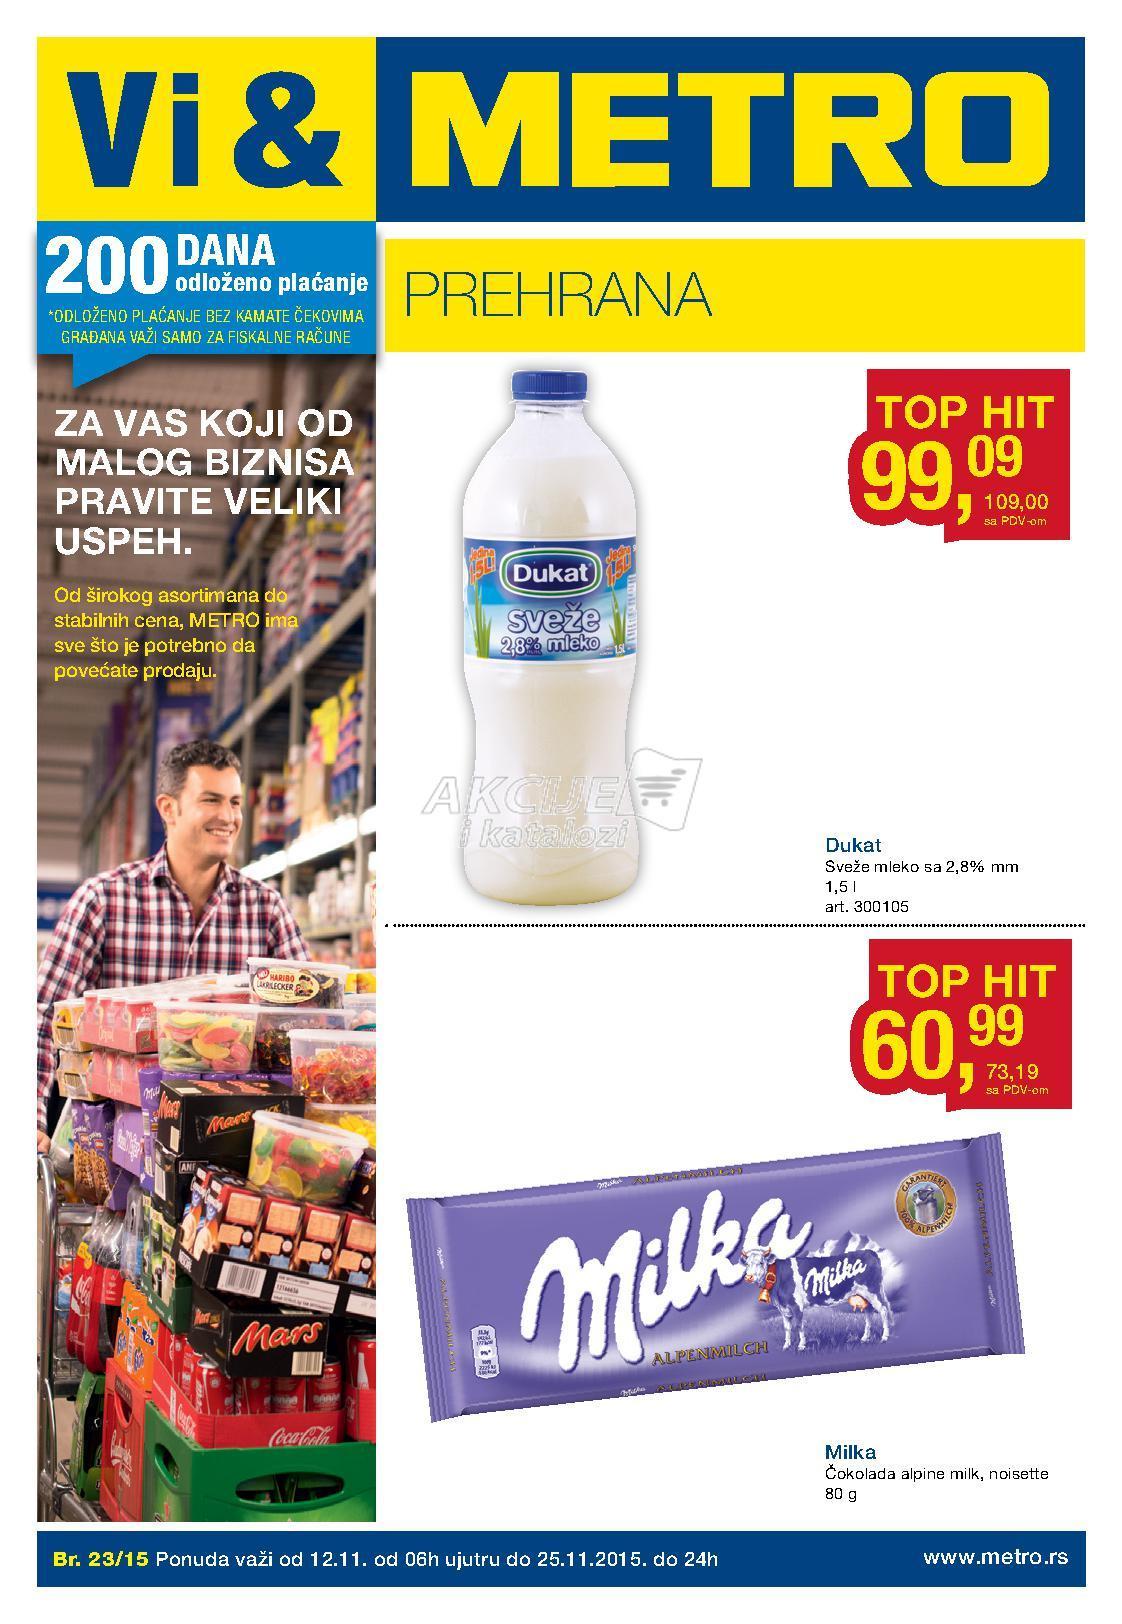 Metro - Redovna akcija odlična kupovina prehrane